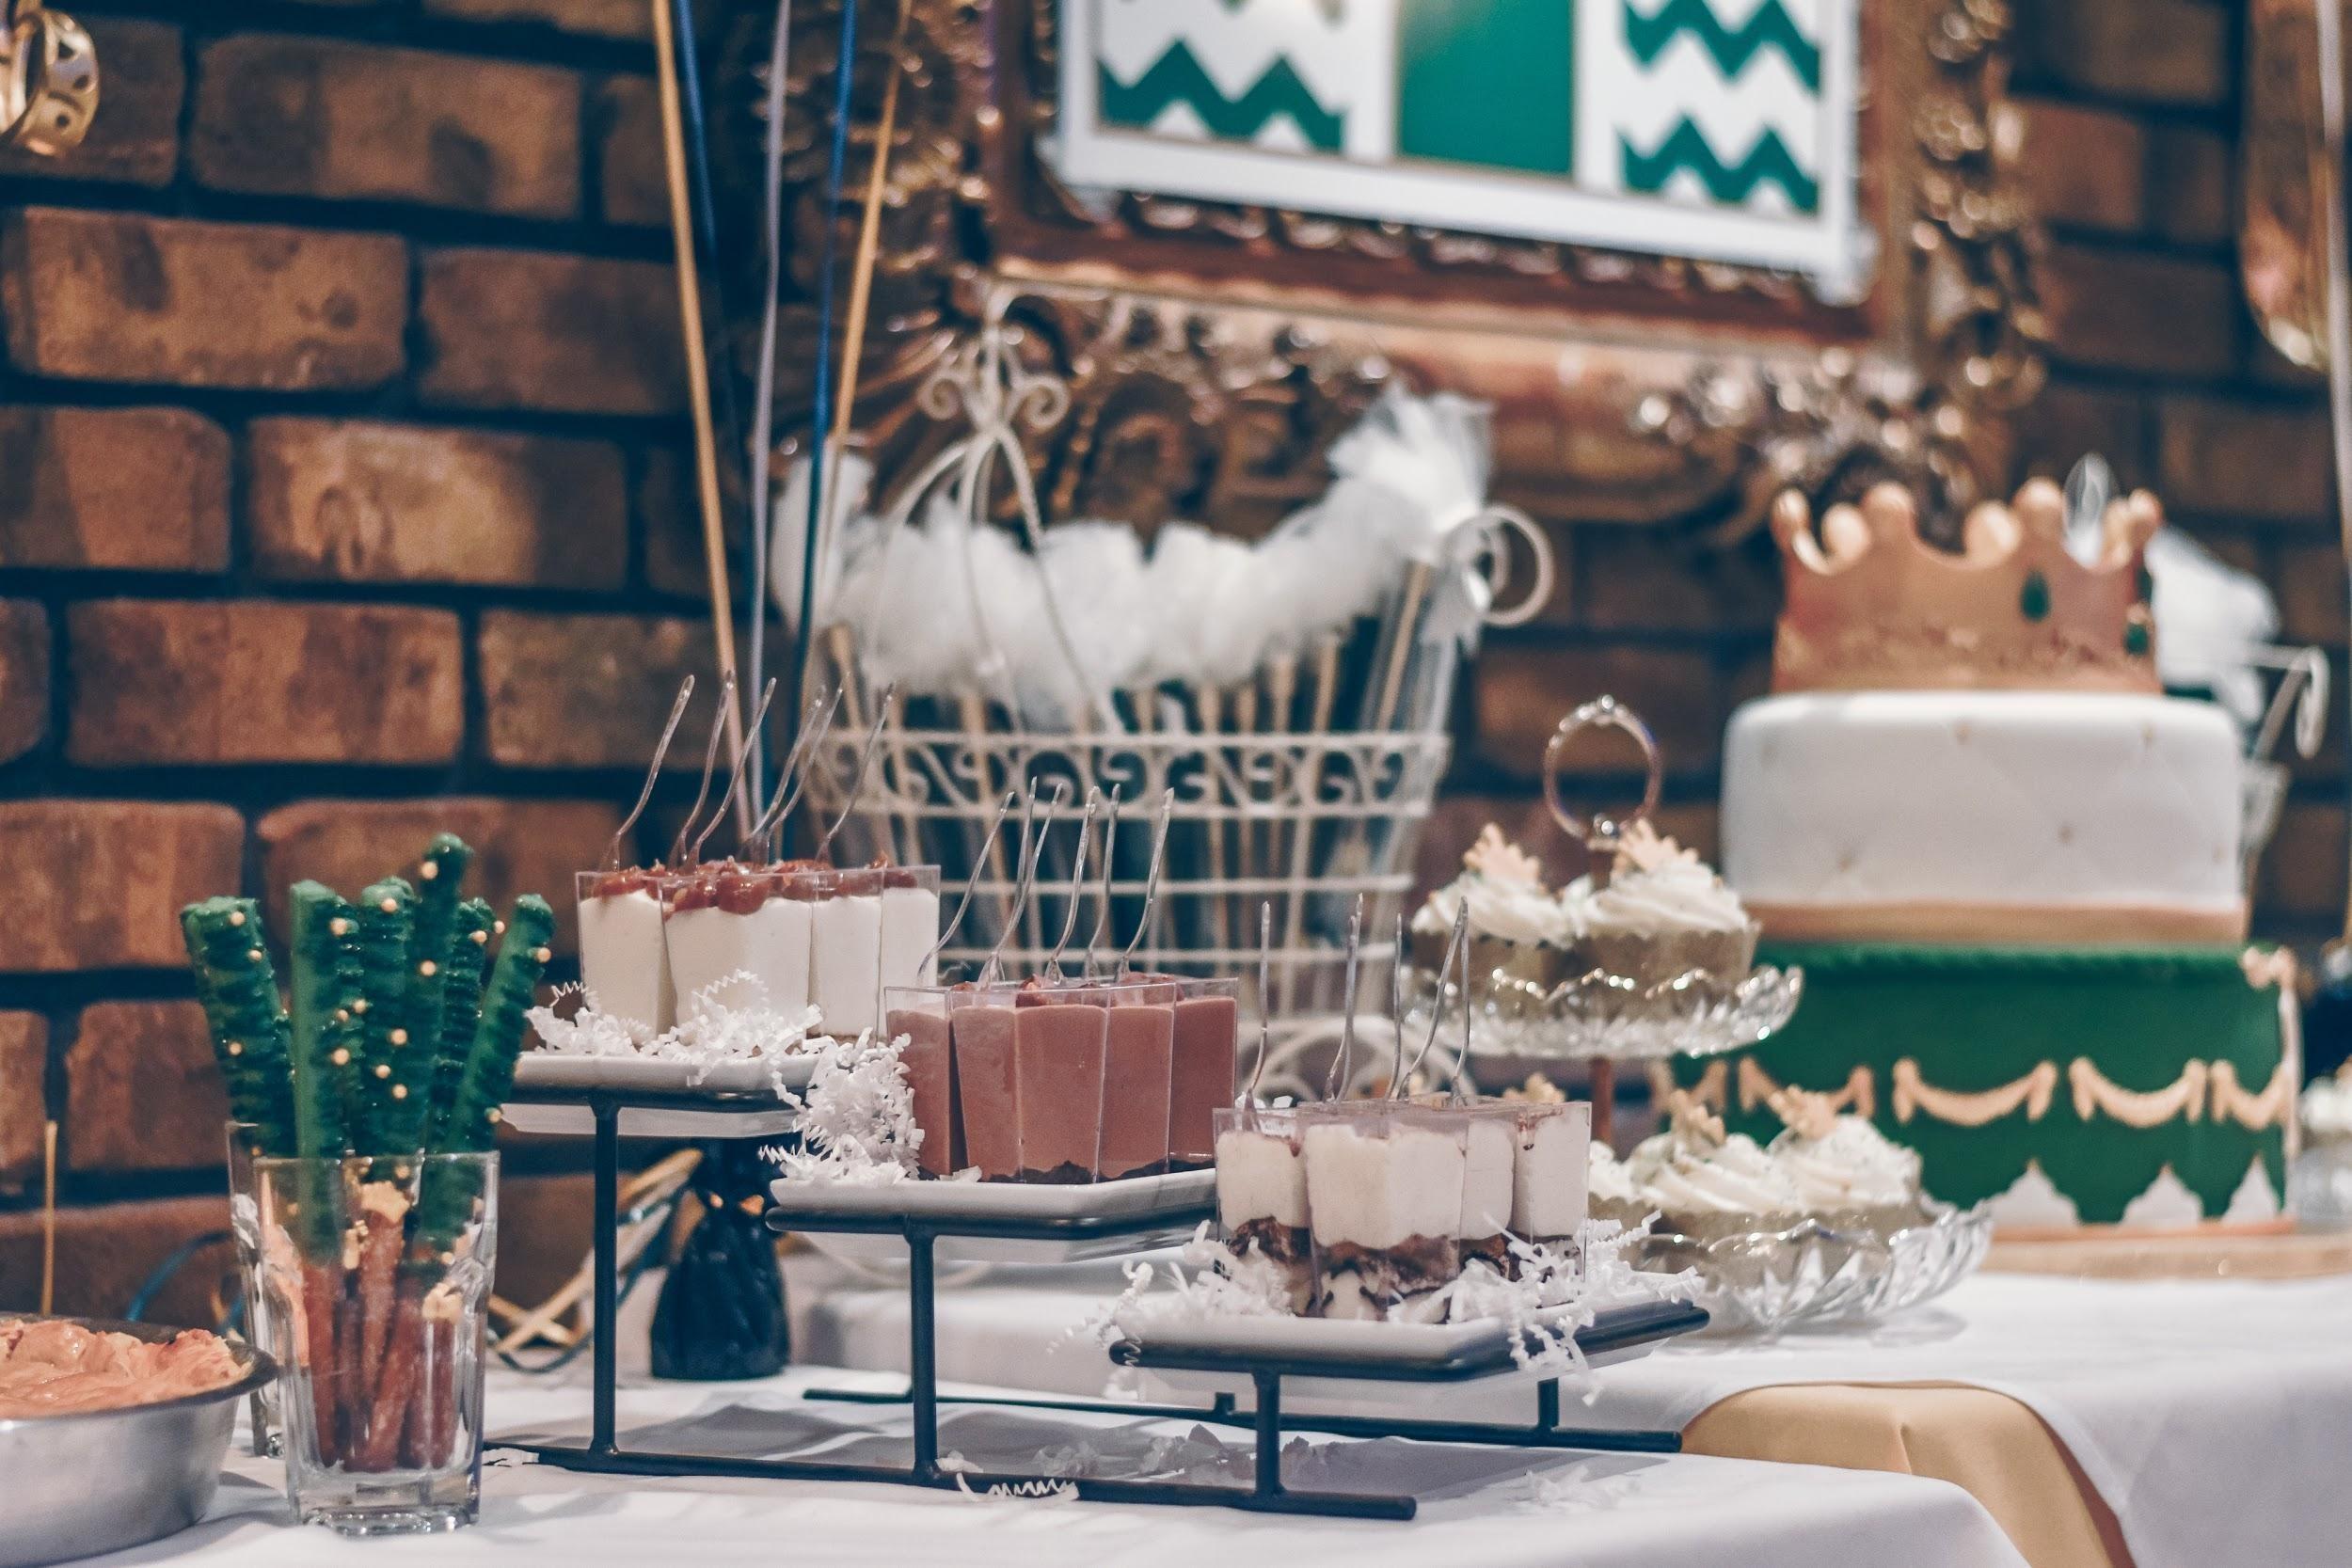 Planning a Winter Wonderland Wedding from North Carolina Lifestyle Blogger Champagne Style Bare Budget